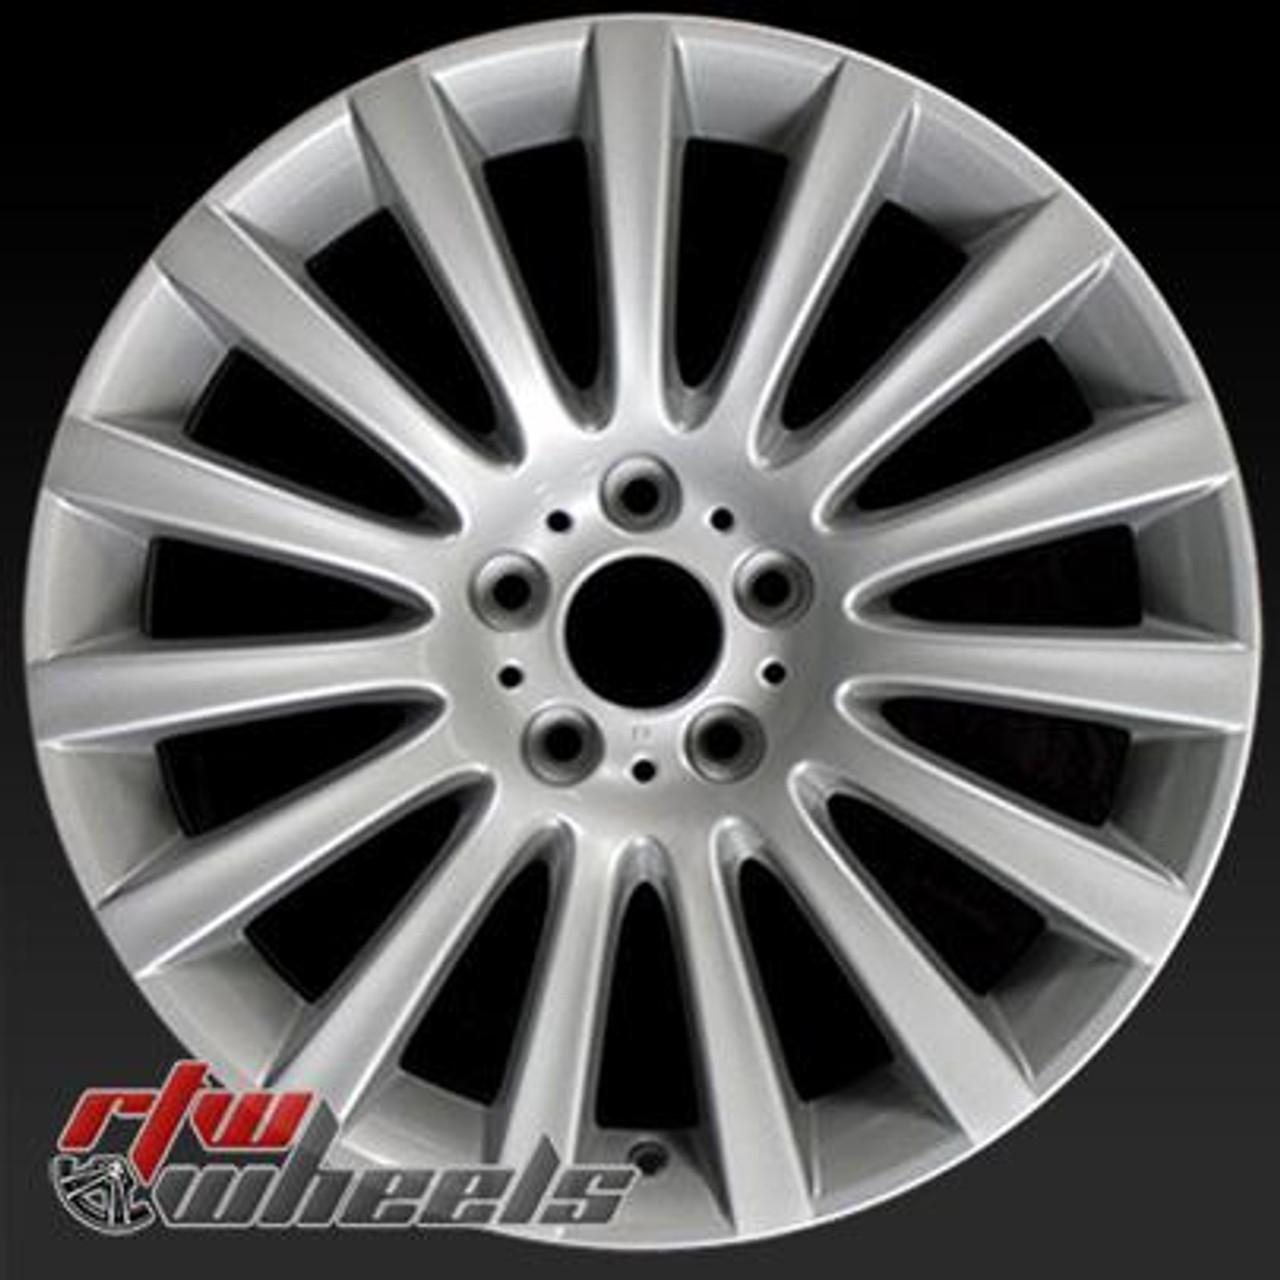 "19x9.5"" BMW 5 Series Wheels For Sale 09-14 Silver Rims 71337"